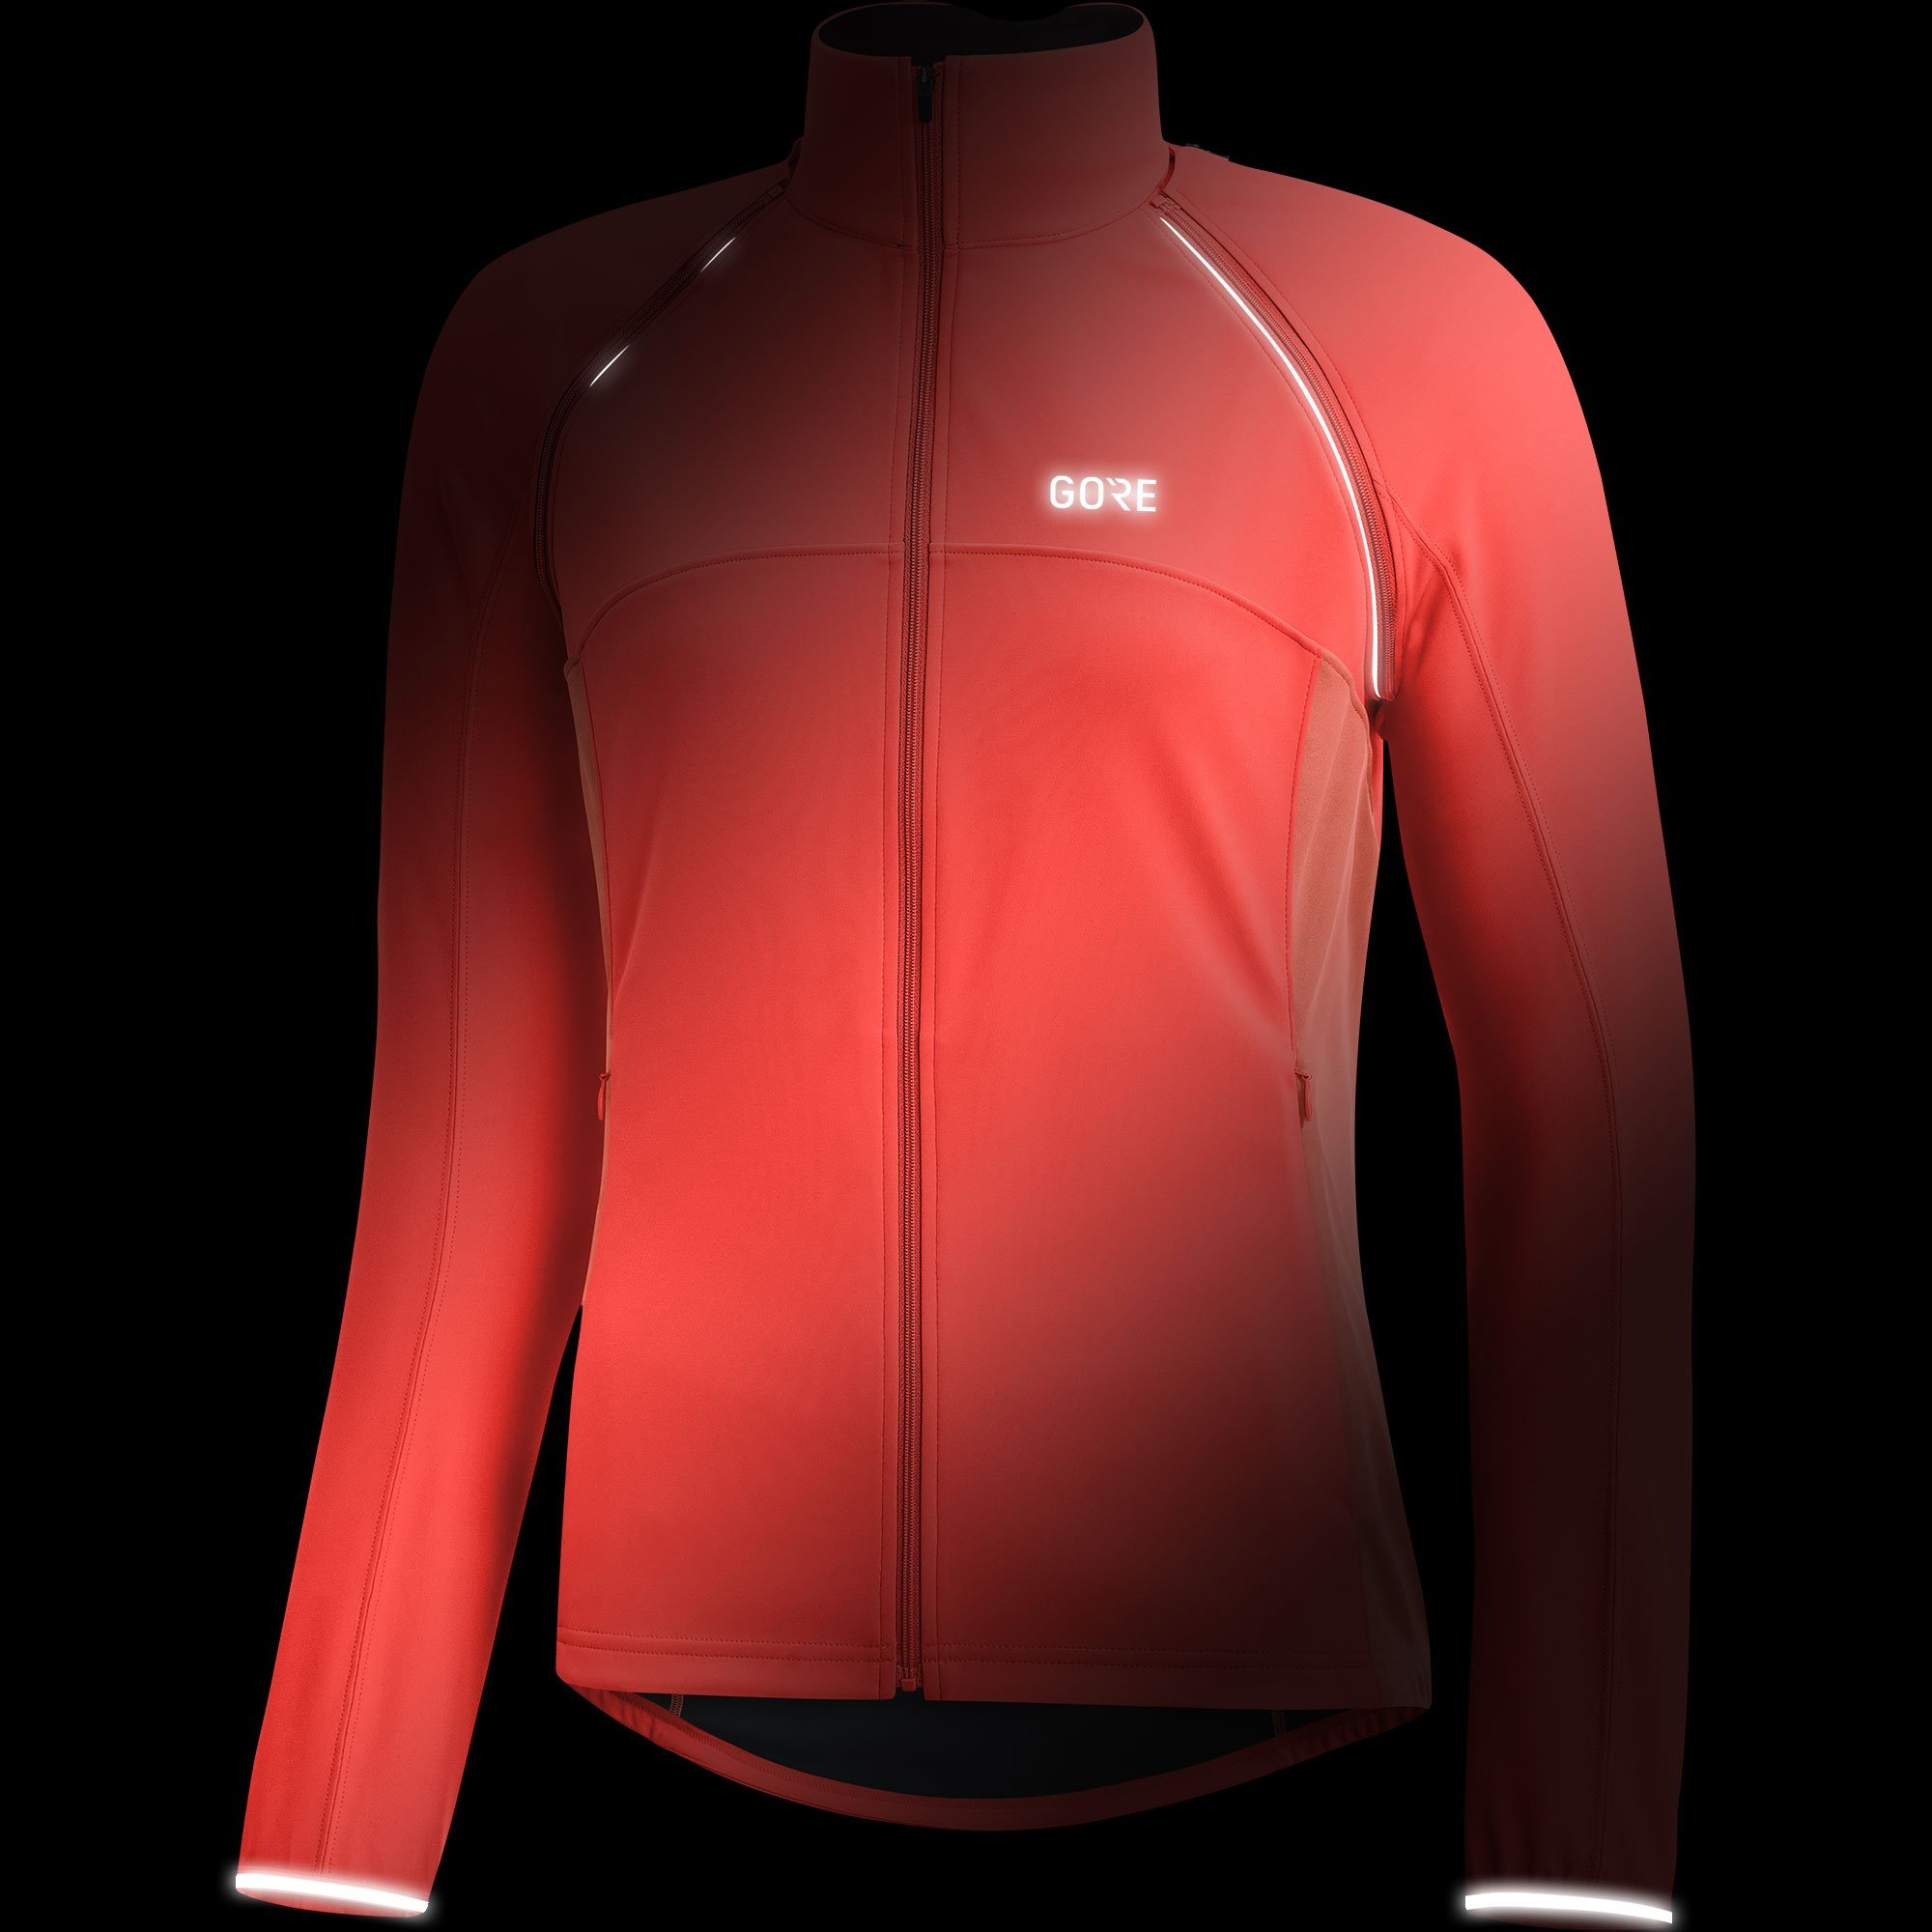 GORE Wear Women's Windproof Cycling Jacket, Removable Sleeves, GORE Wear C3 Women's GORE Wear WINDSTOPPER Phantom Zip-Off Jacket, Size: M, Color: Lumi Orange/Coral Glow, 100191 by GORE WEAR (Image #2)